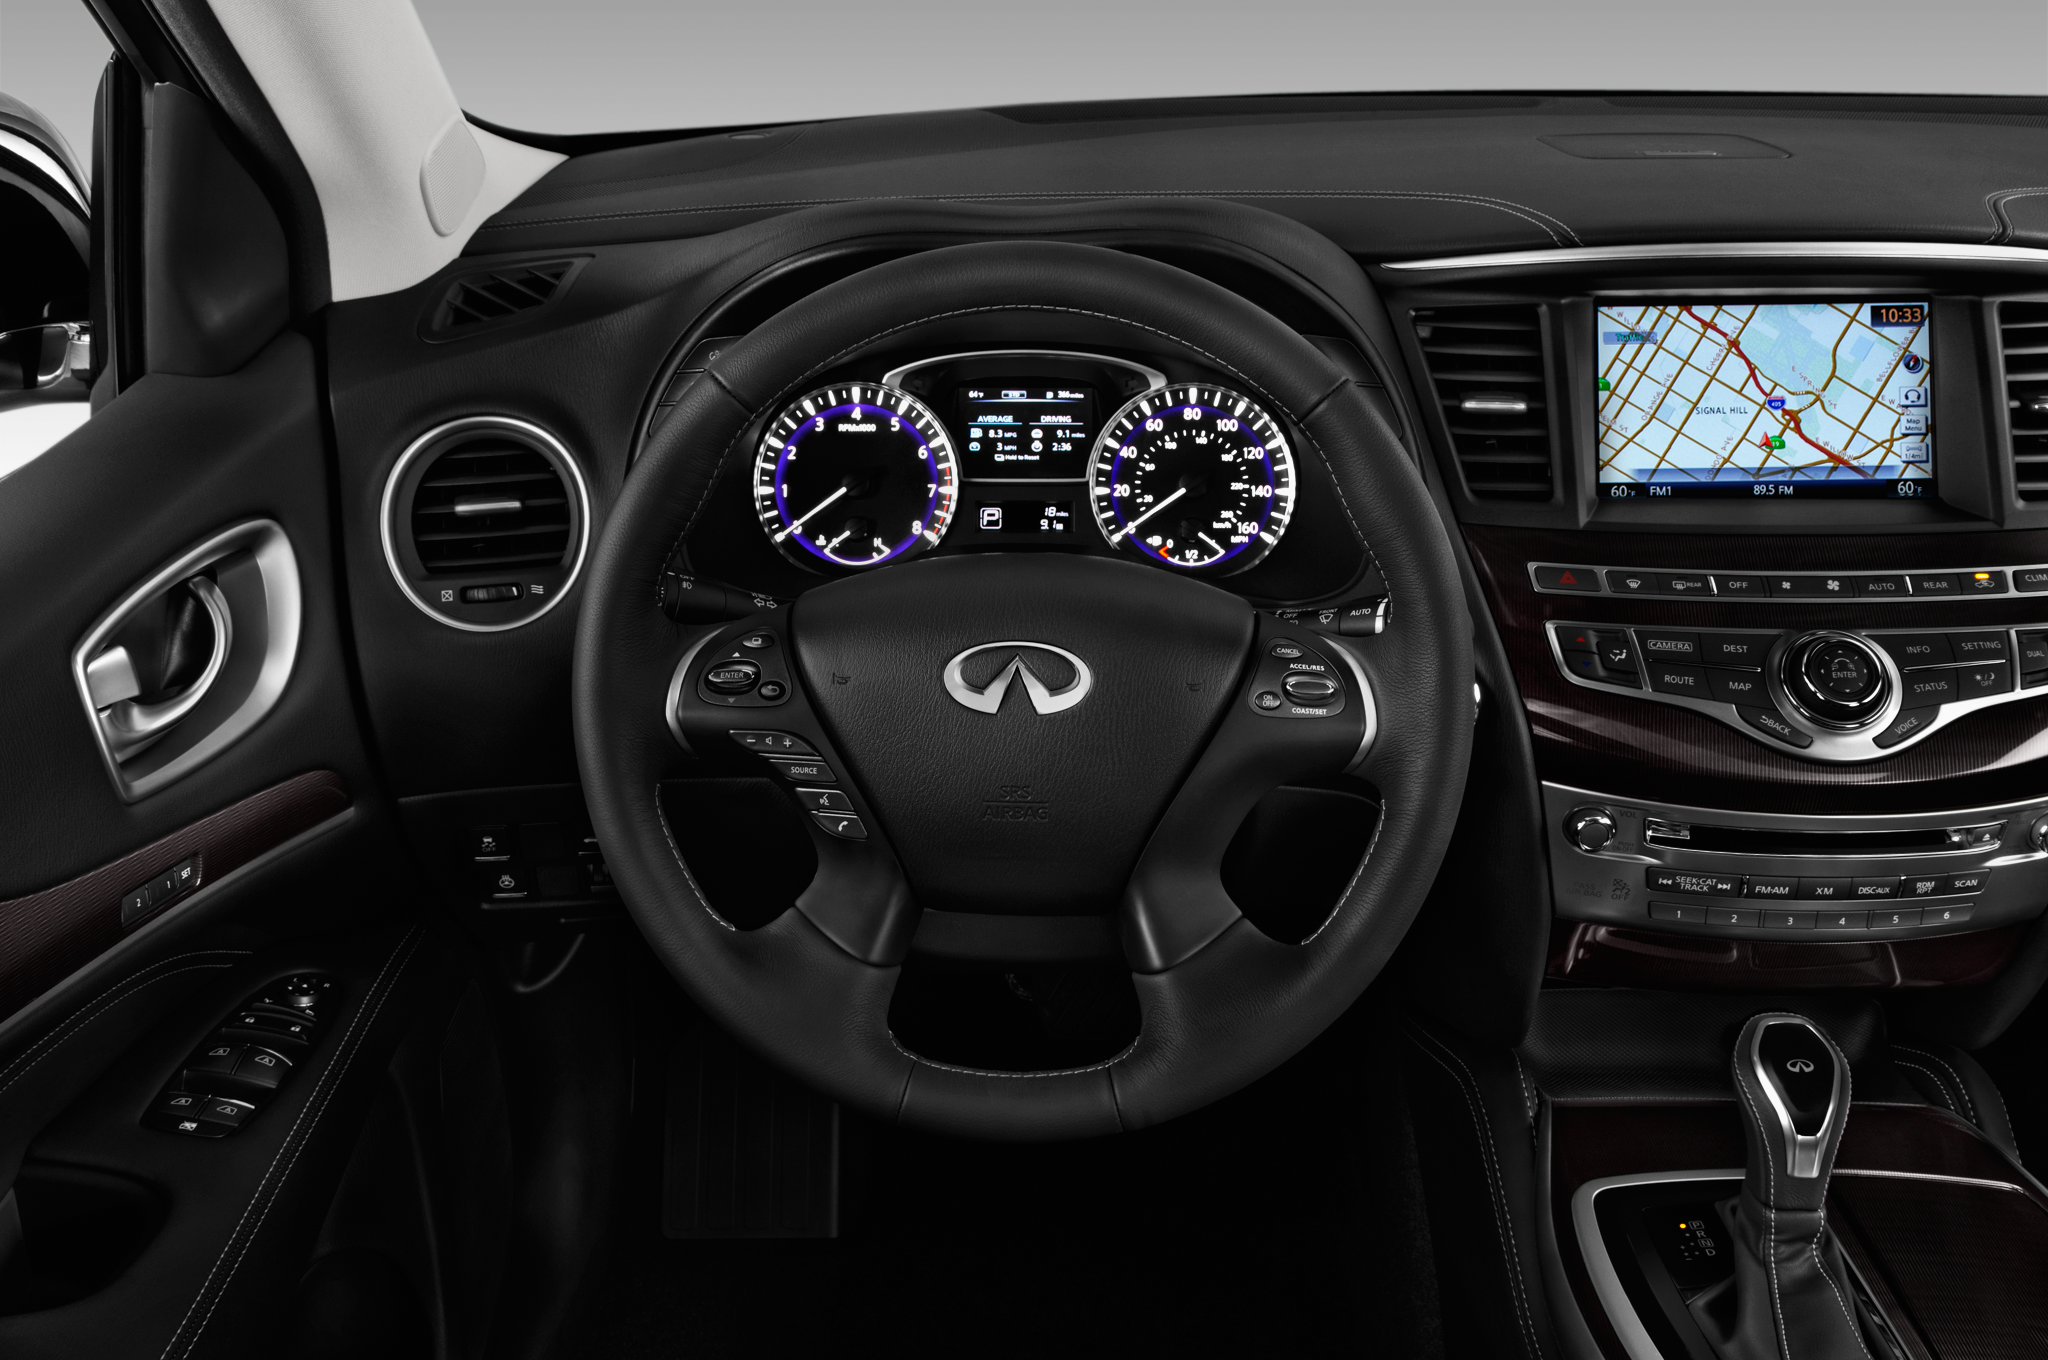 Infiniti Teases Q60 Concept Ahead of Detroit Debut